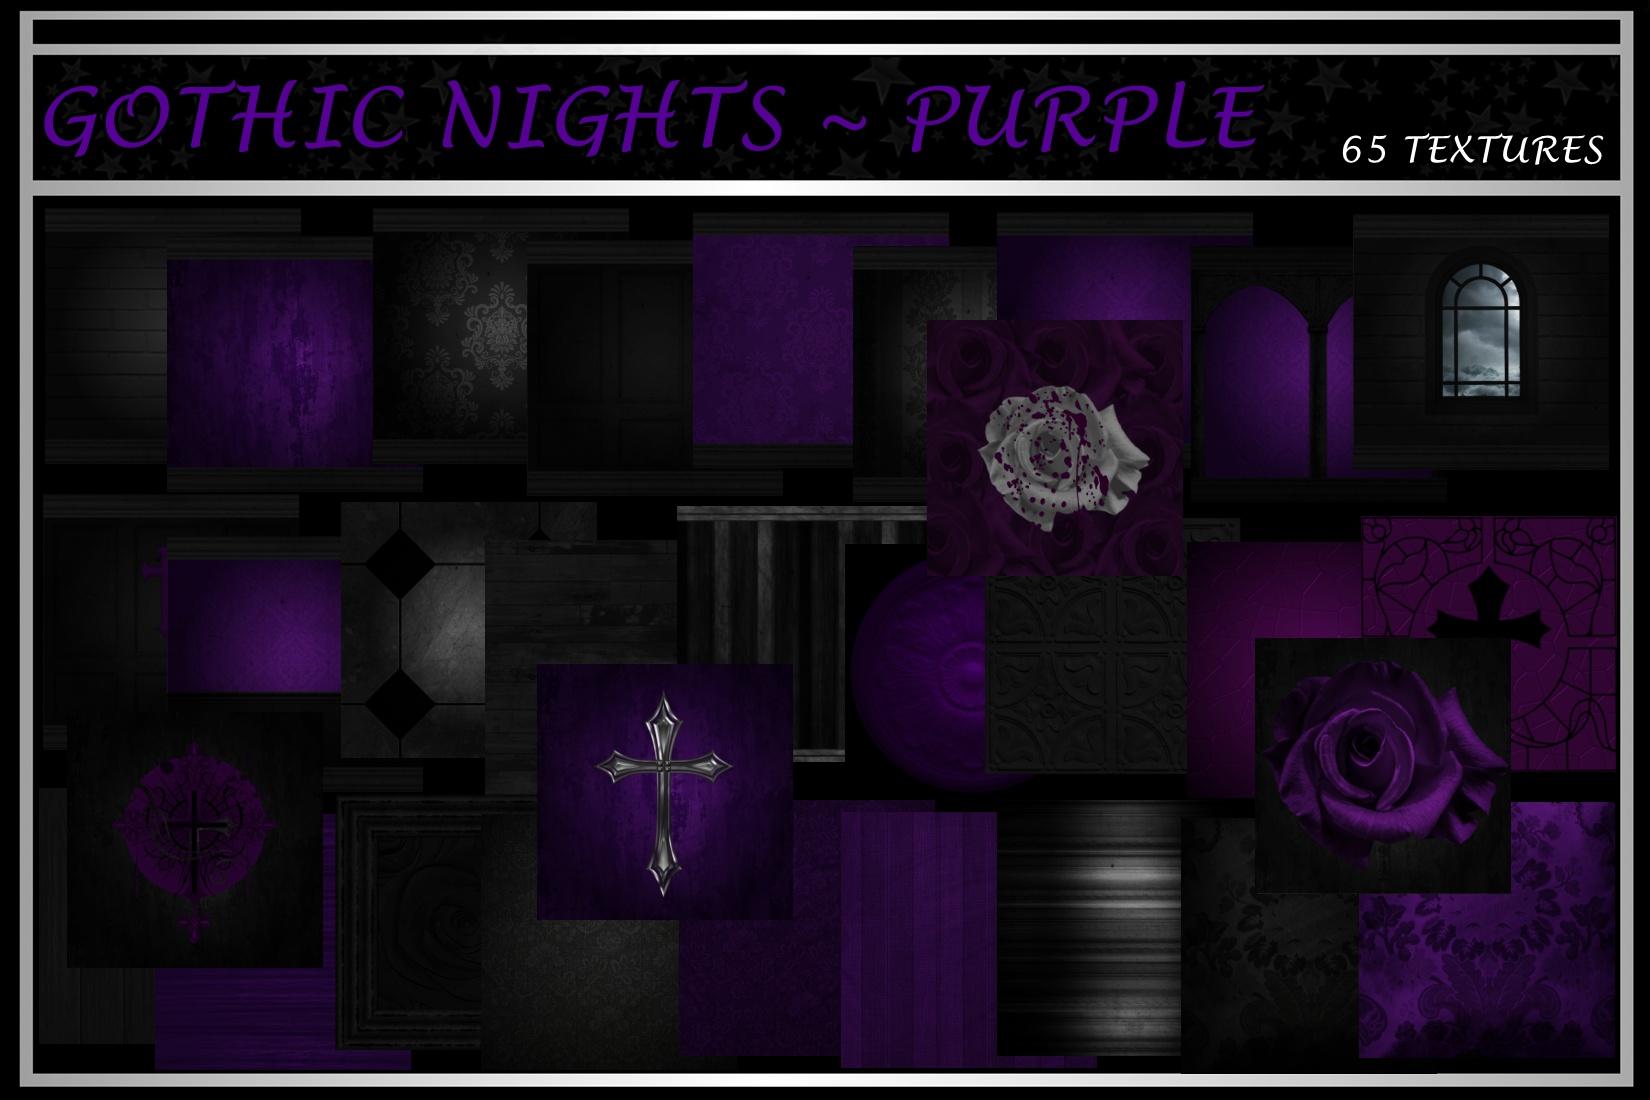 GOTHIC NIGHTS ~ PURPLE